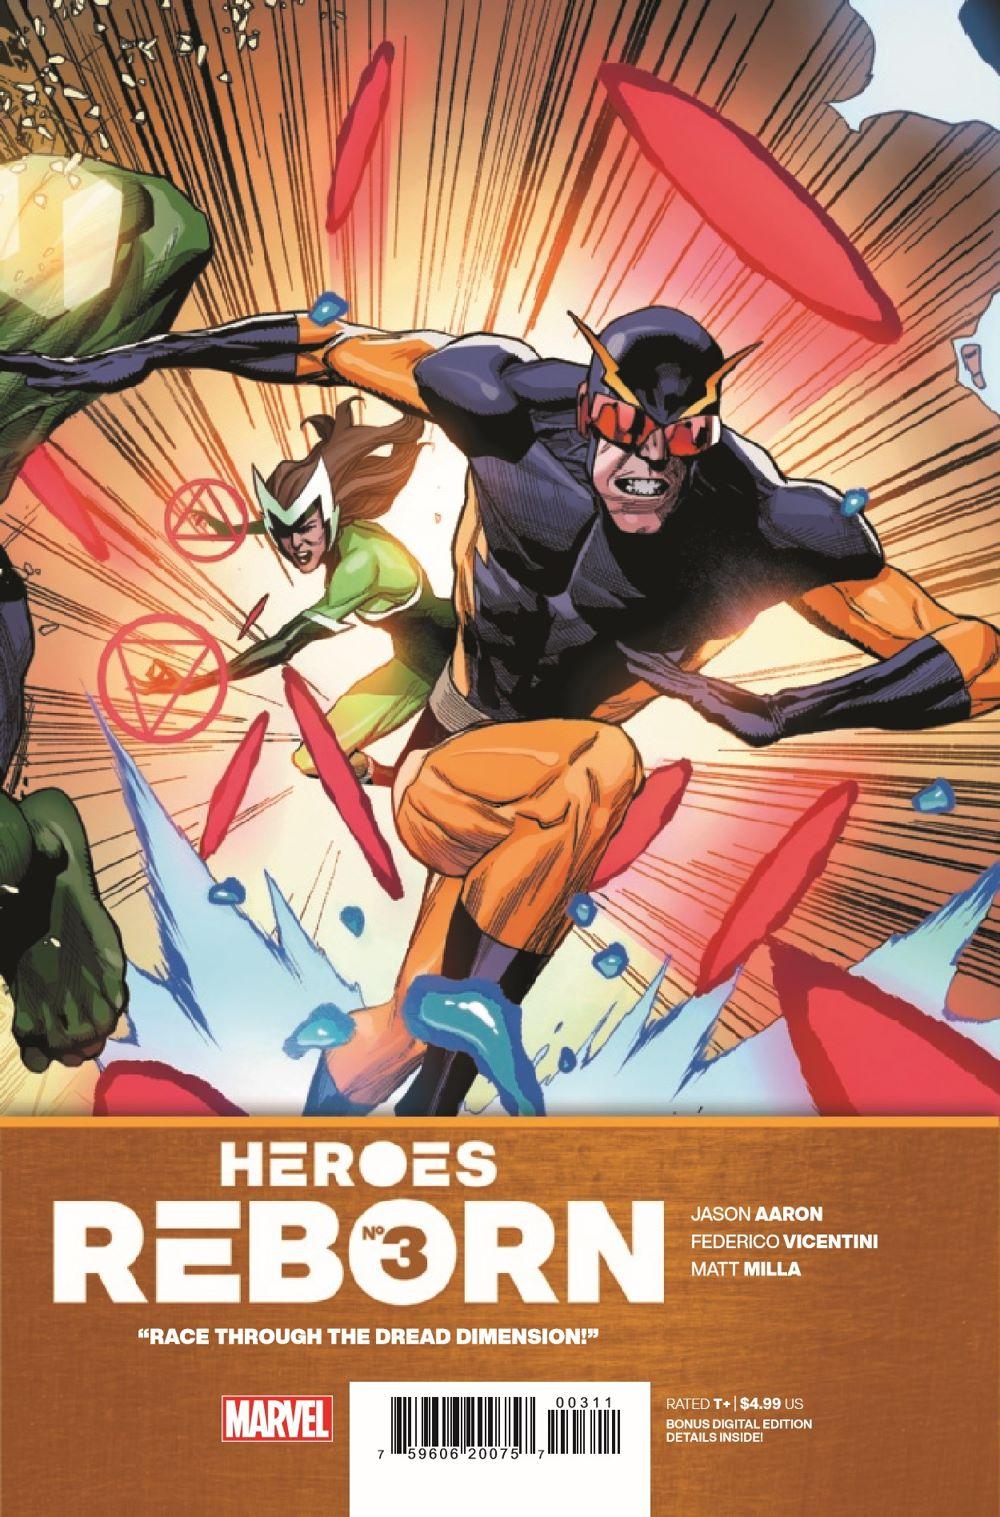 HEROESREBORN2021003_Preview-1 ComicList Previews: HEROES REBORN #3 (OF 7)